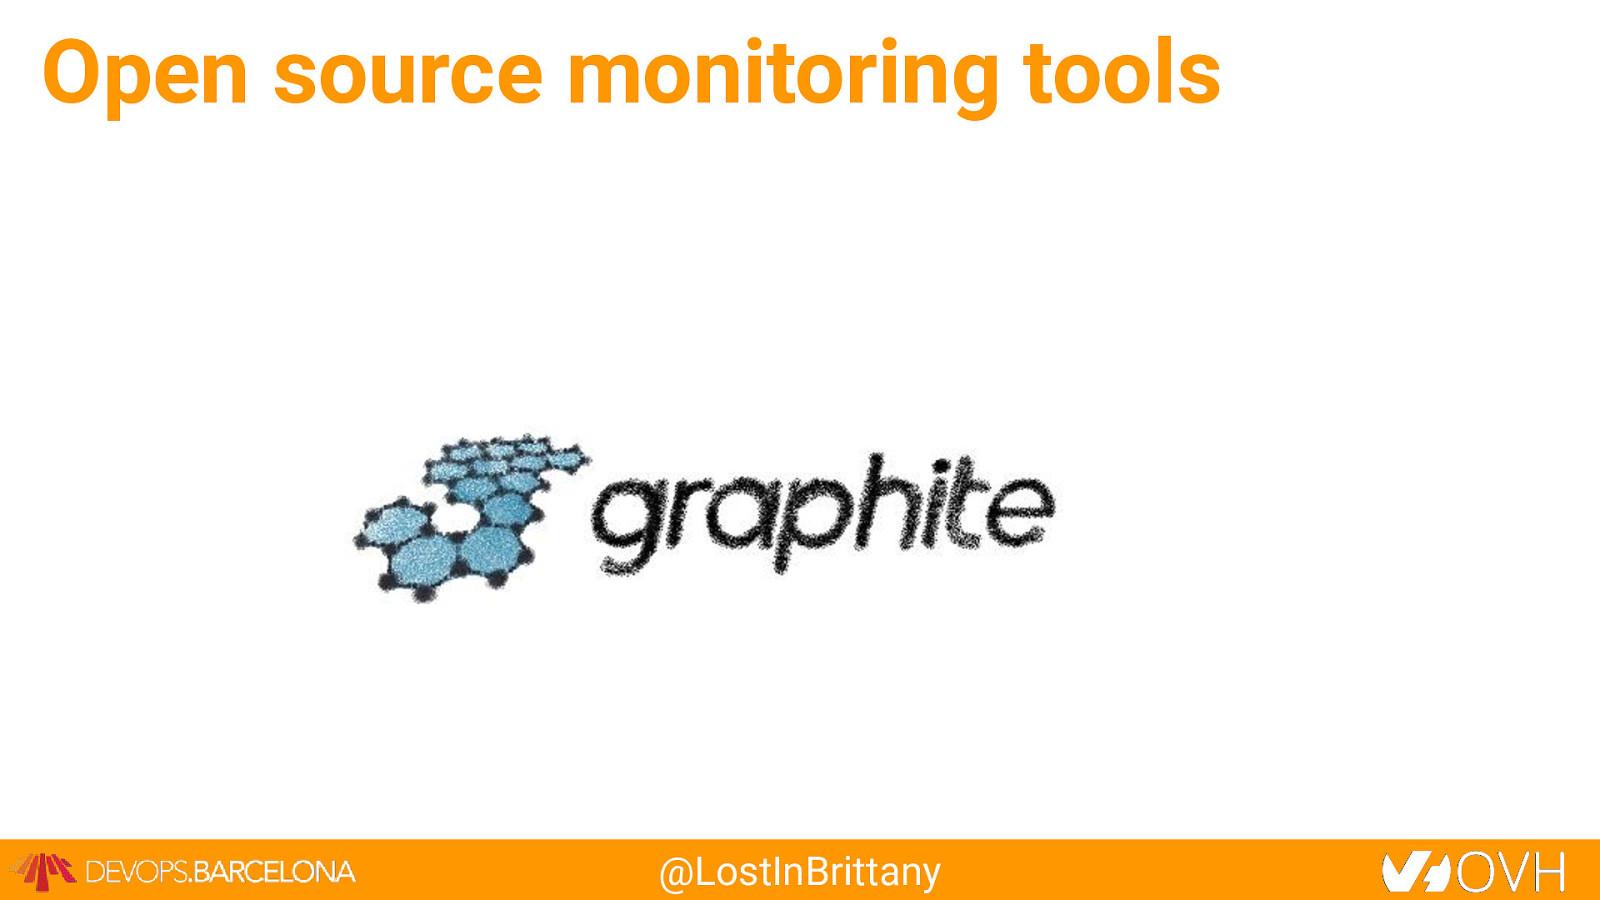 Monitoring OVH: 300k servers, 27 DCs and one Metrics platform